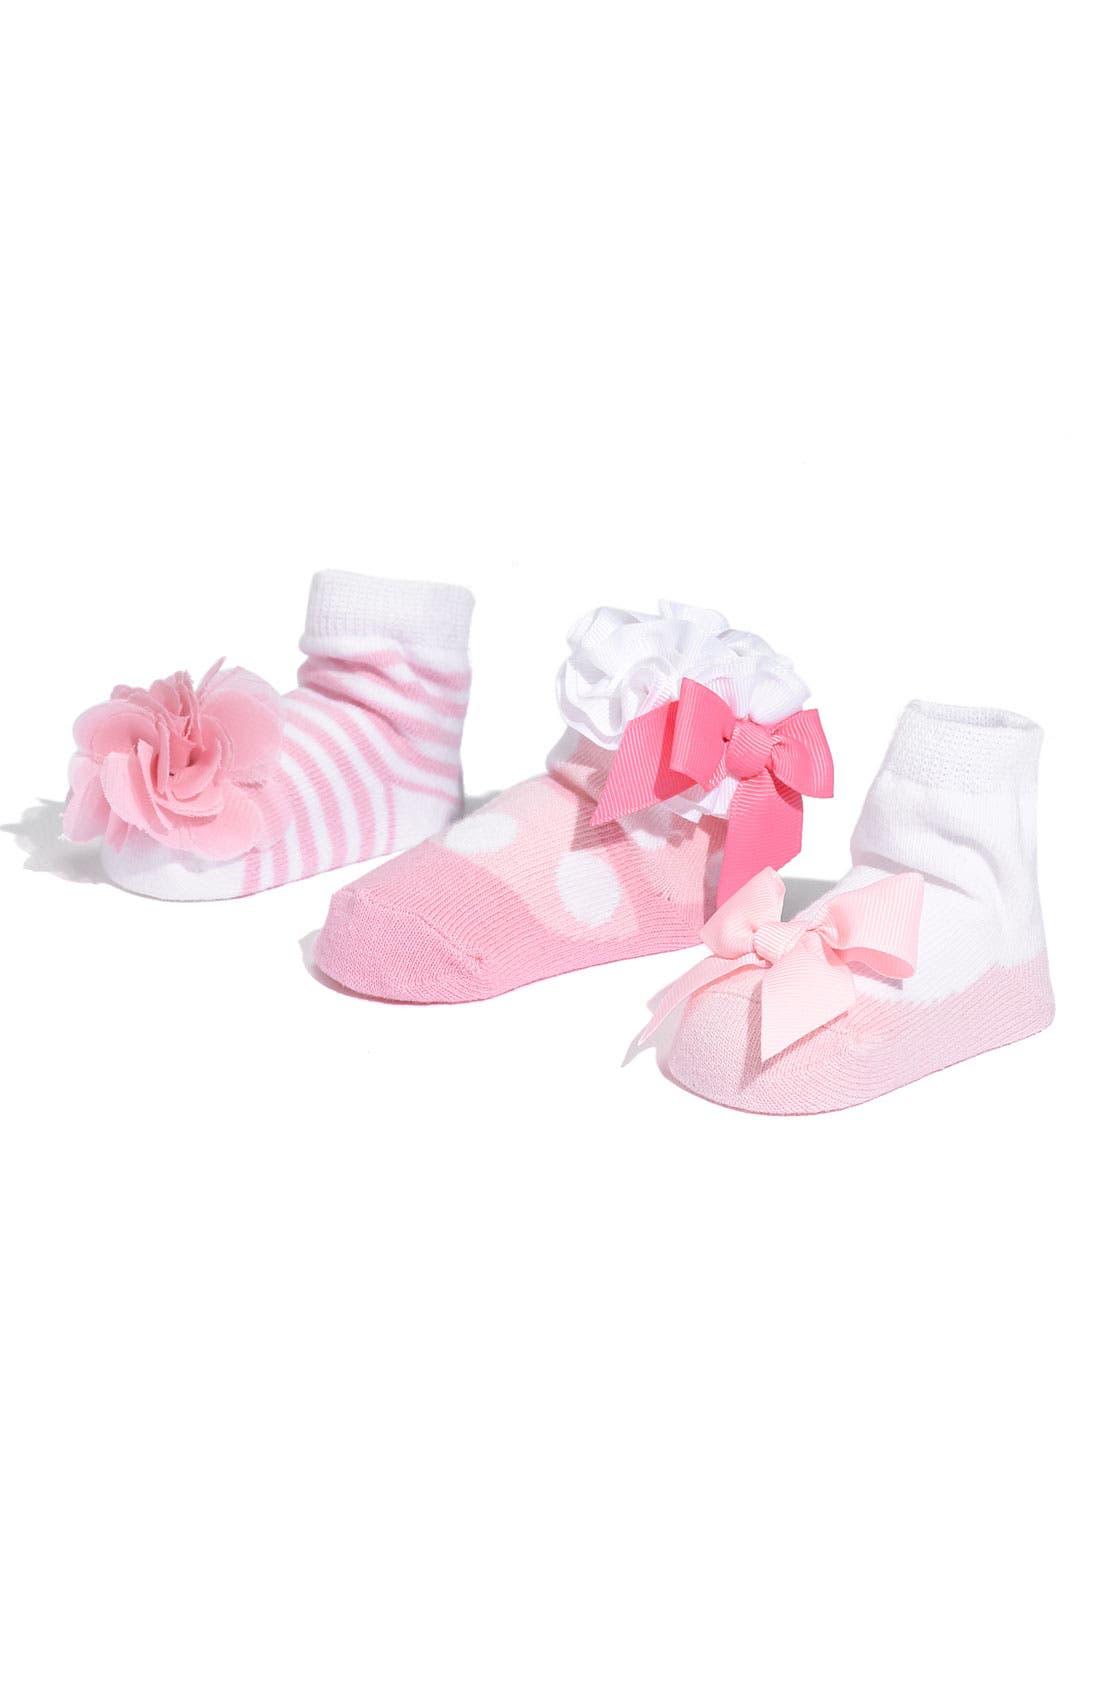 Socks Set,                             Main thumbnail 1, color,                             NEW PINK/ WHITE